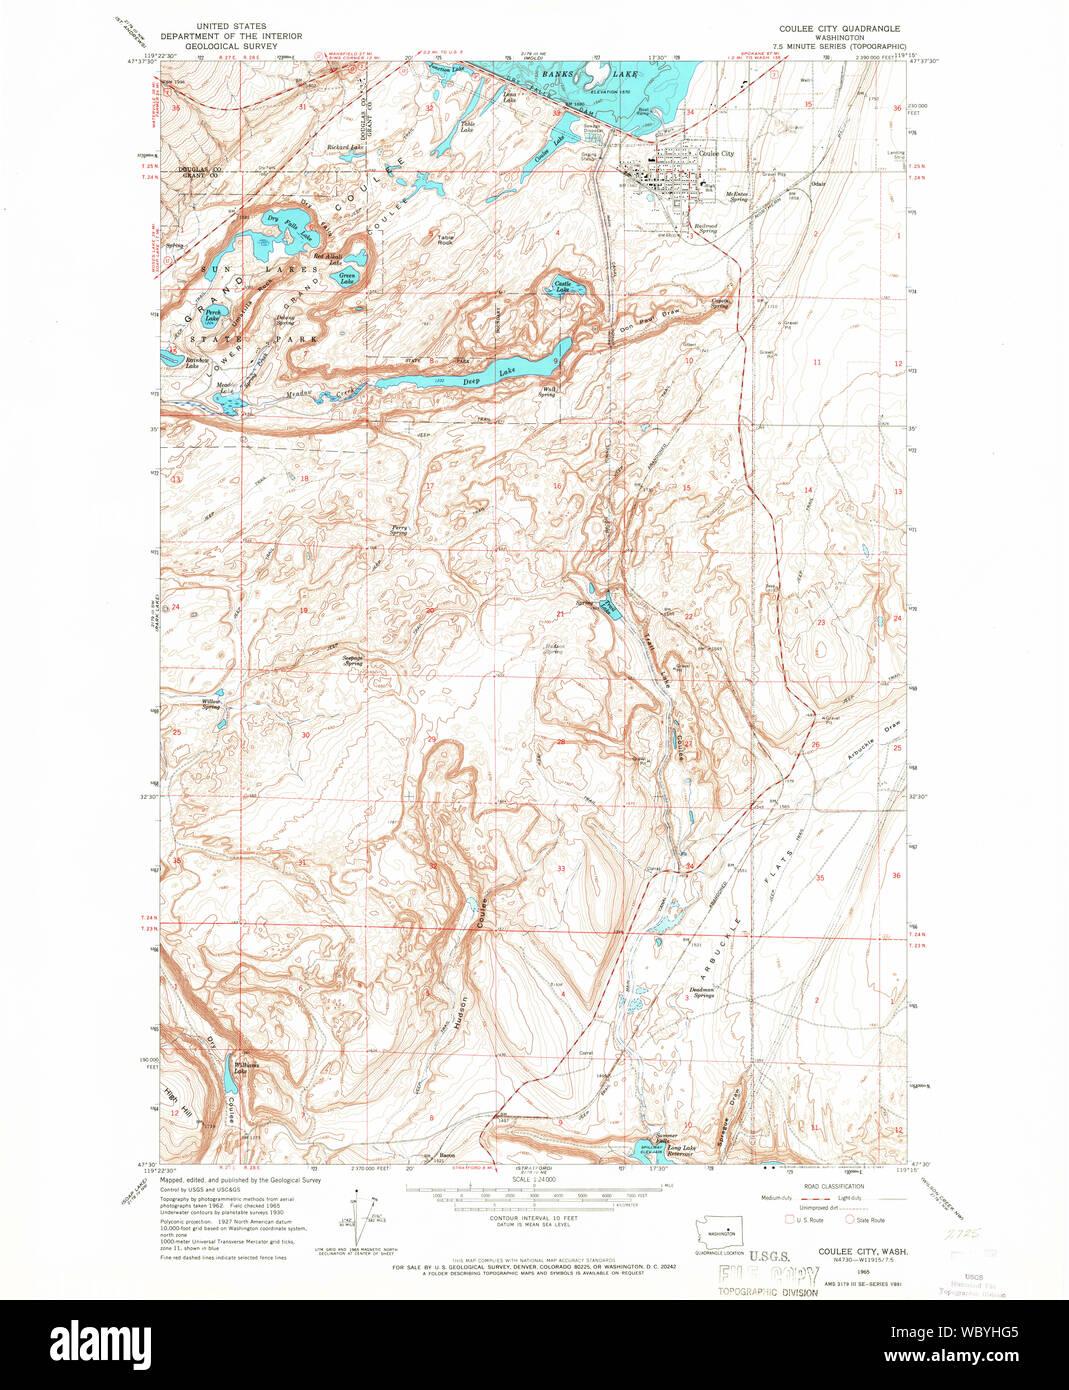 USGS Topo Map Washington State WA Coulee City 240708 1965 ... City Map Of Washington State on city of wisconsin map, city of germany map, city of chicago map, city of alabama map, city of new orleans map, city of puerto rico map, city of oklahoma map, city of marquette map, city of georgia map, city of idaho map, city of cincinnati map, city of miami map, city of montana map, city of kentucky map, city of seattle map, city of delaware map, city of virginia map, city of california map, city of tennessee map, city of louisiana map,